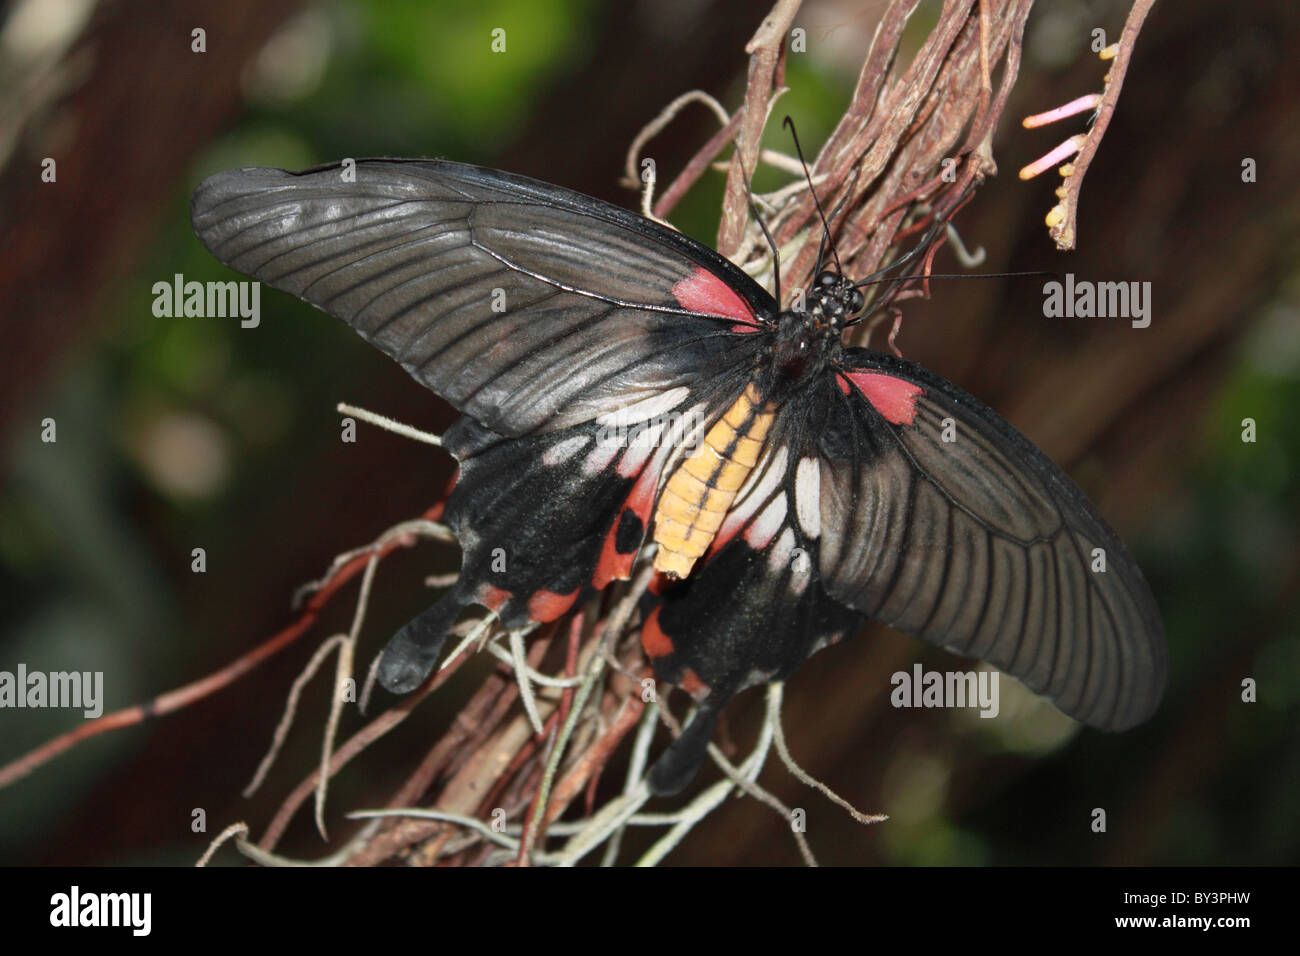 Femmina a coda di rondine asiatici (Papilio lowi). Farfalle in The Glasshouse 2011, giardino RHS Wisley, Woking, Immagini Stock